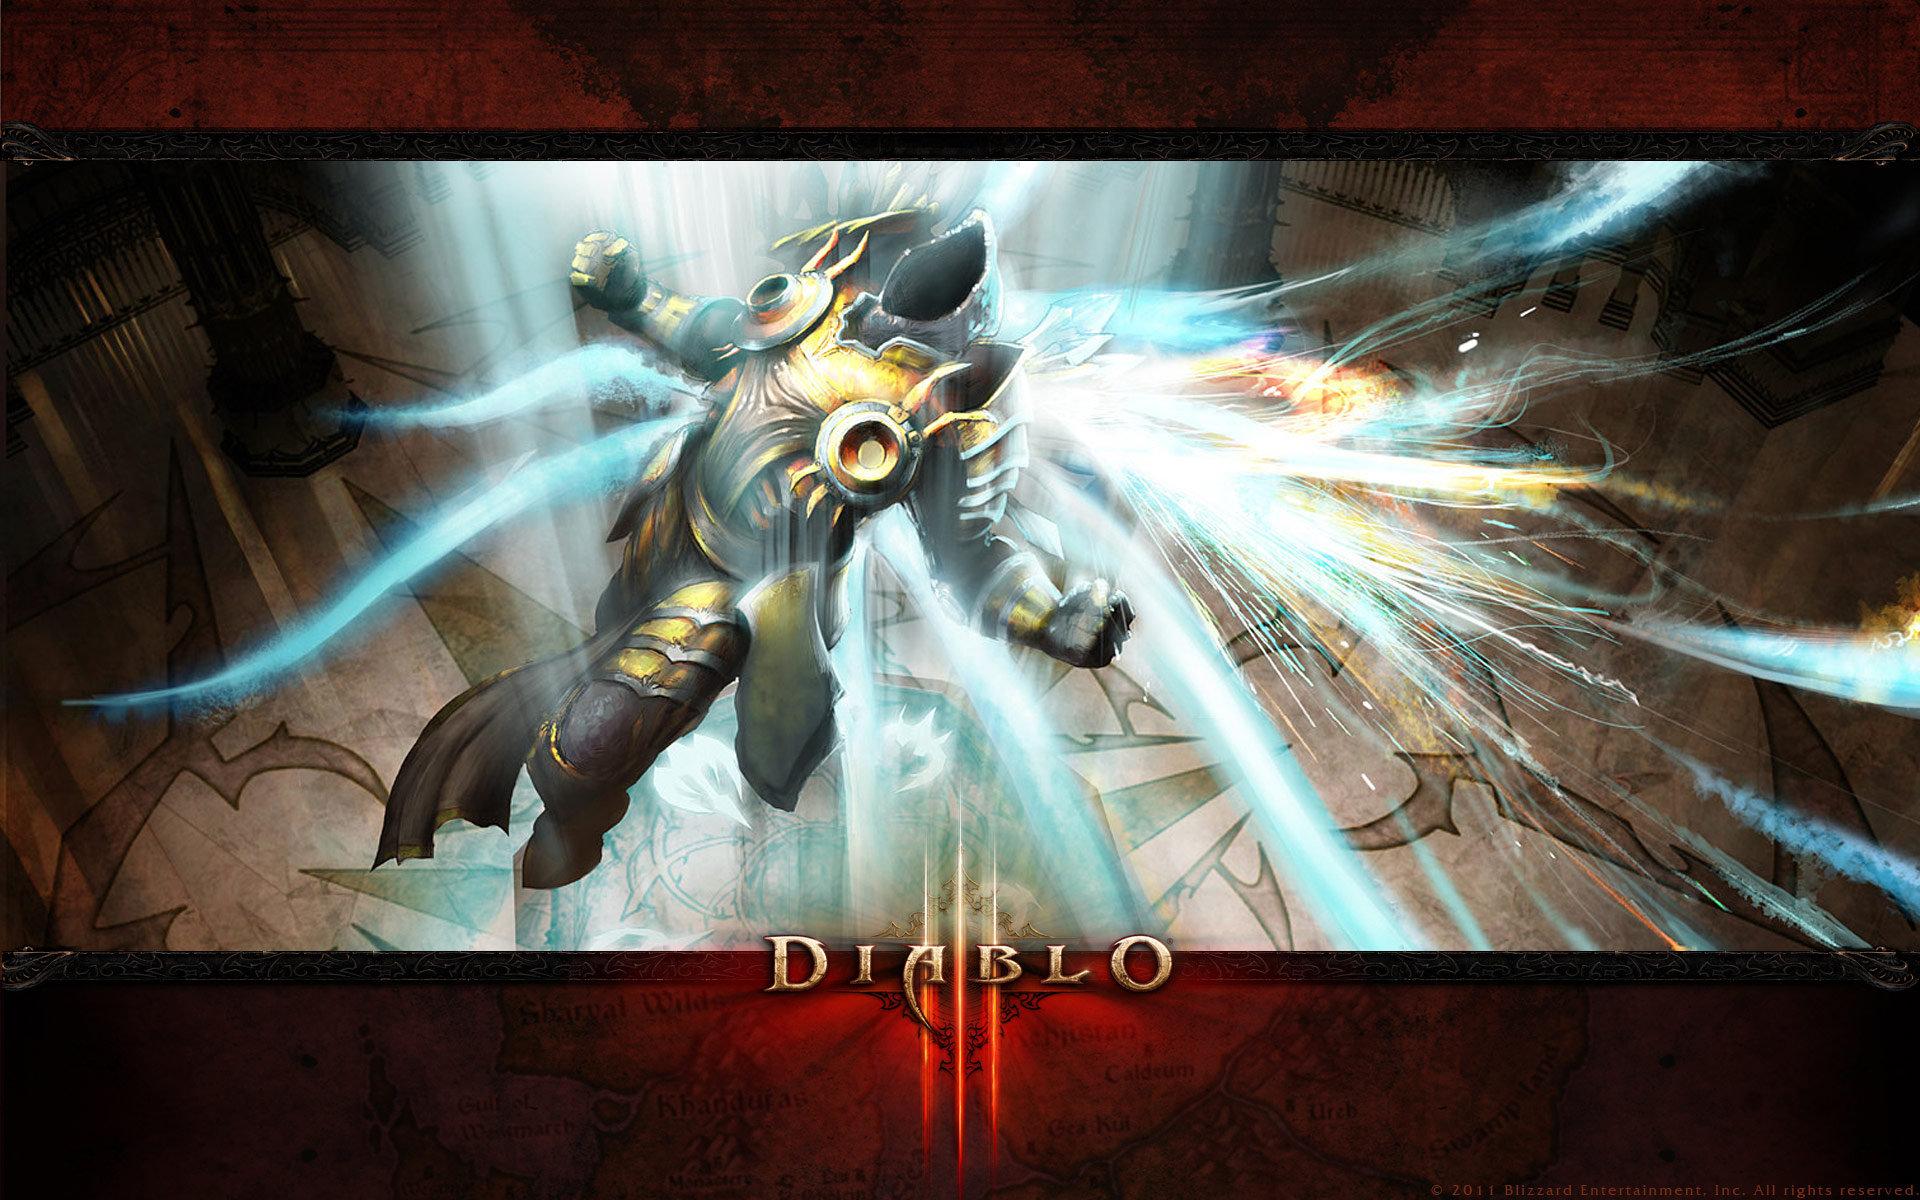 Diablo 3 wallpaper nsfw videos